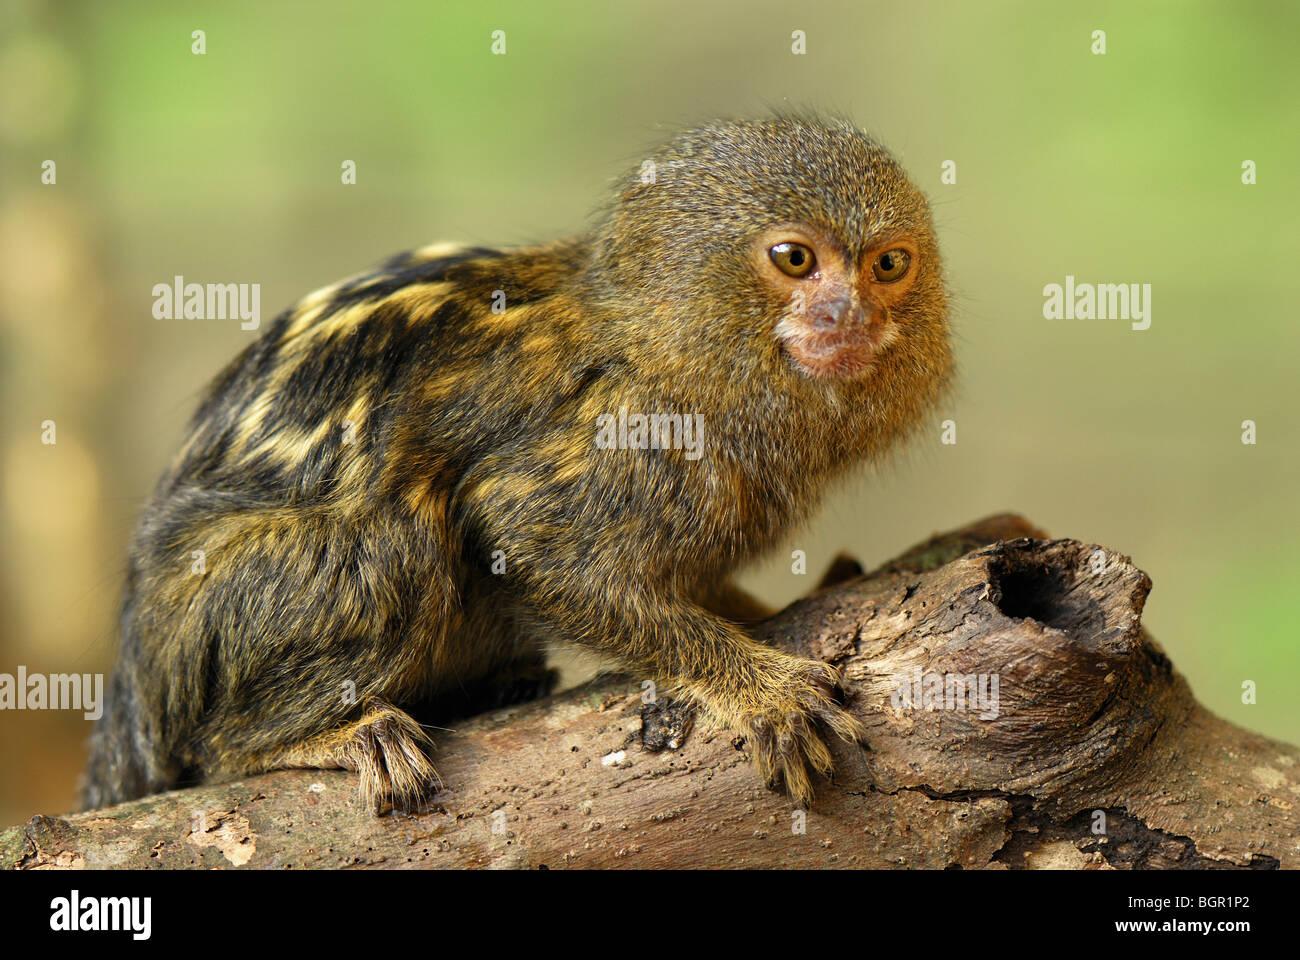 Pygmy Marmoset (Callithrix pygmaea), adult, Amazon Forest, Leticia, Colombia - Stock Image